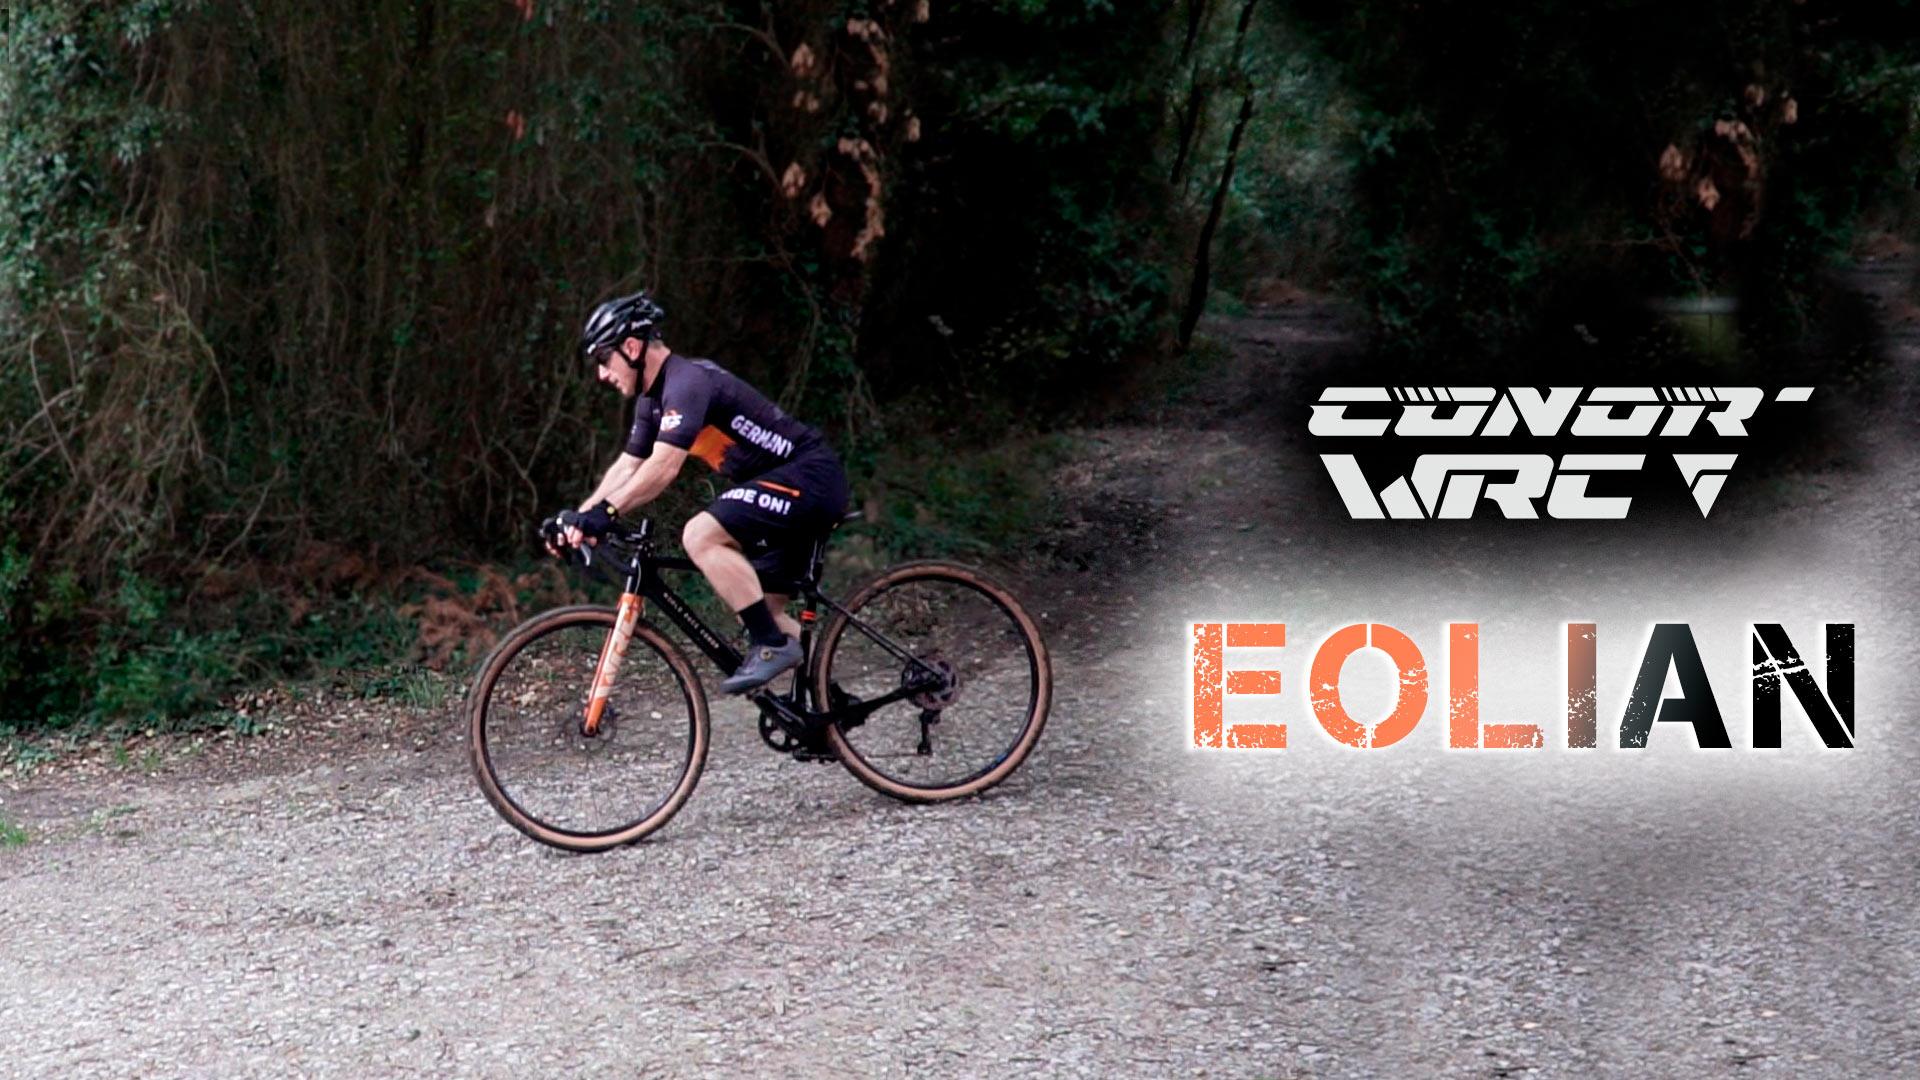 CONOR WRC EOLIAN una gravel de 2021